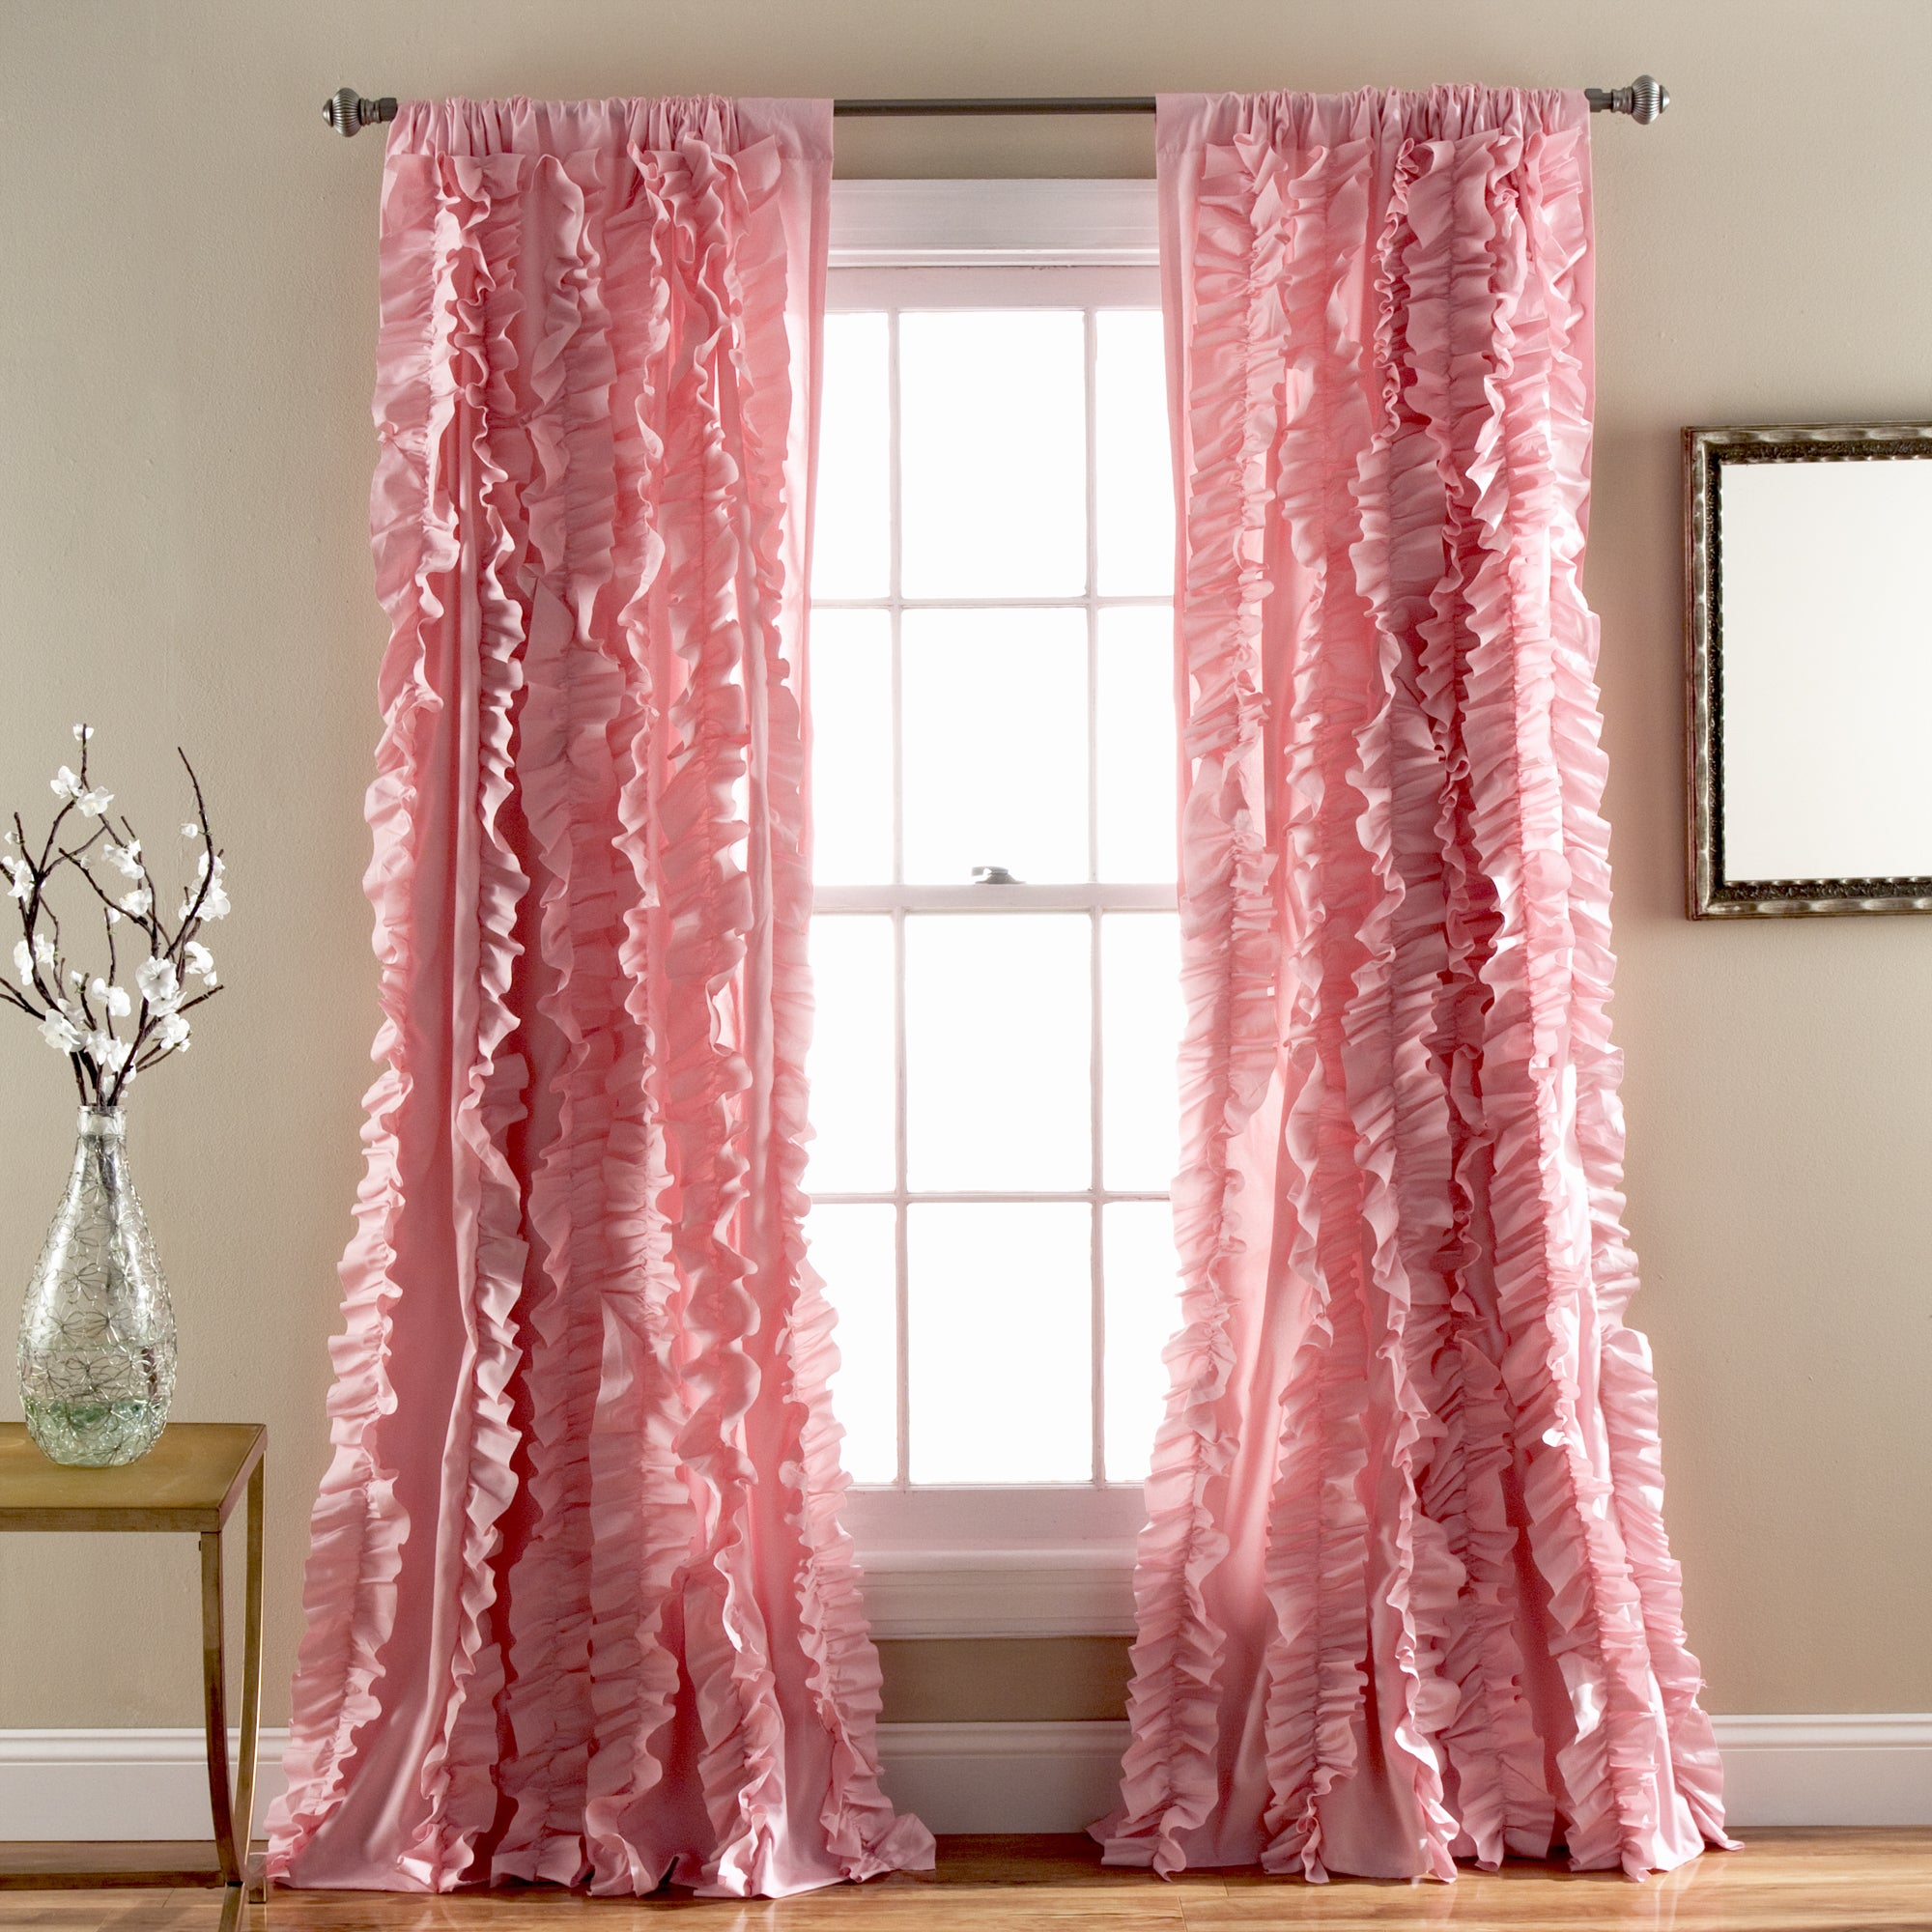 Lush Decor Belle 84-inch Curtain Panel - 54 x 84